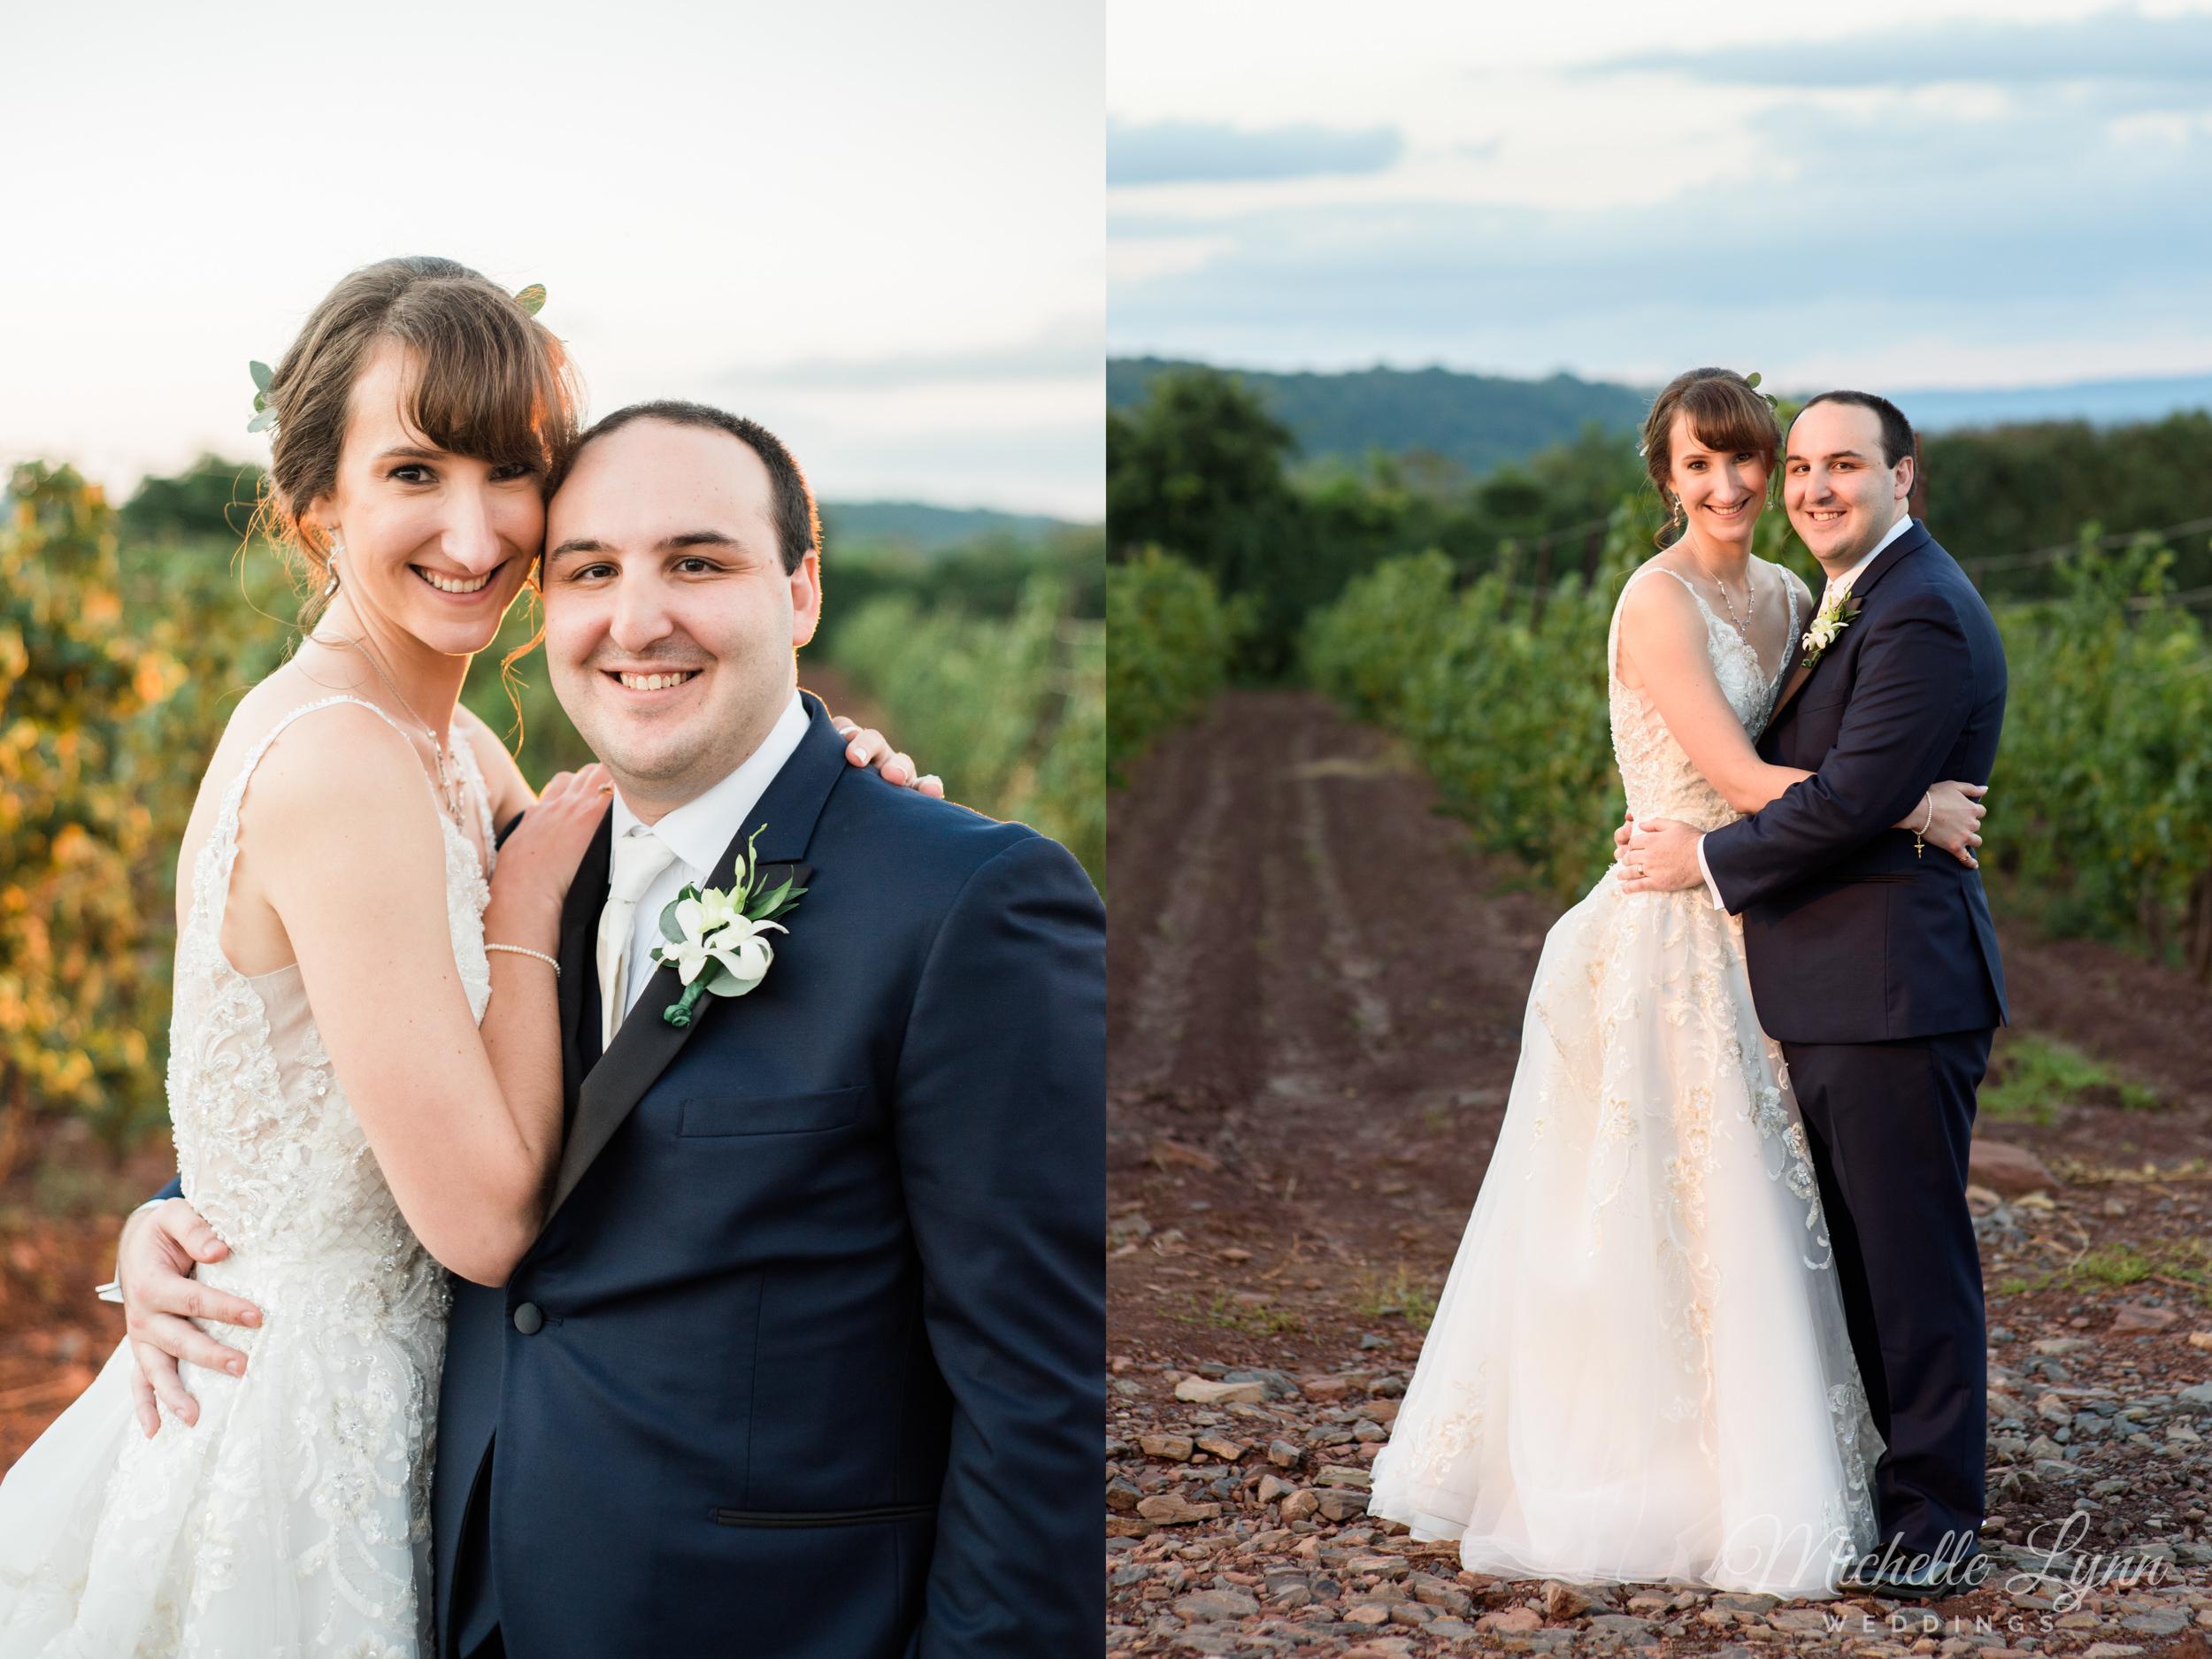 sand-castle-winery-pennsylvania-wedding-photography-86.jpg